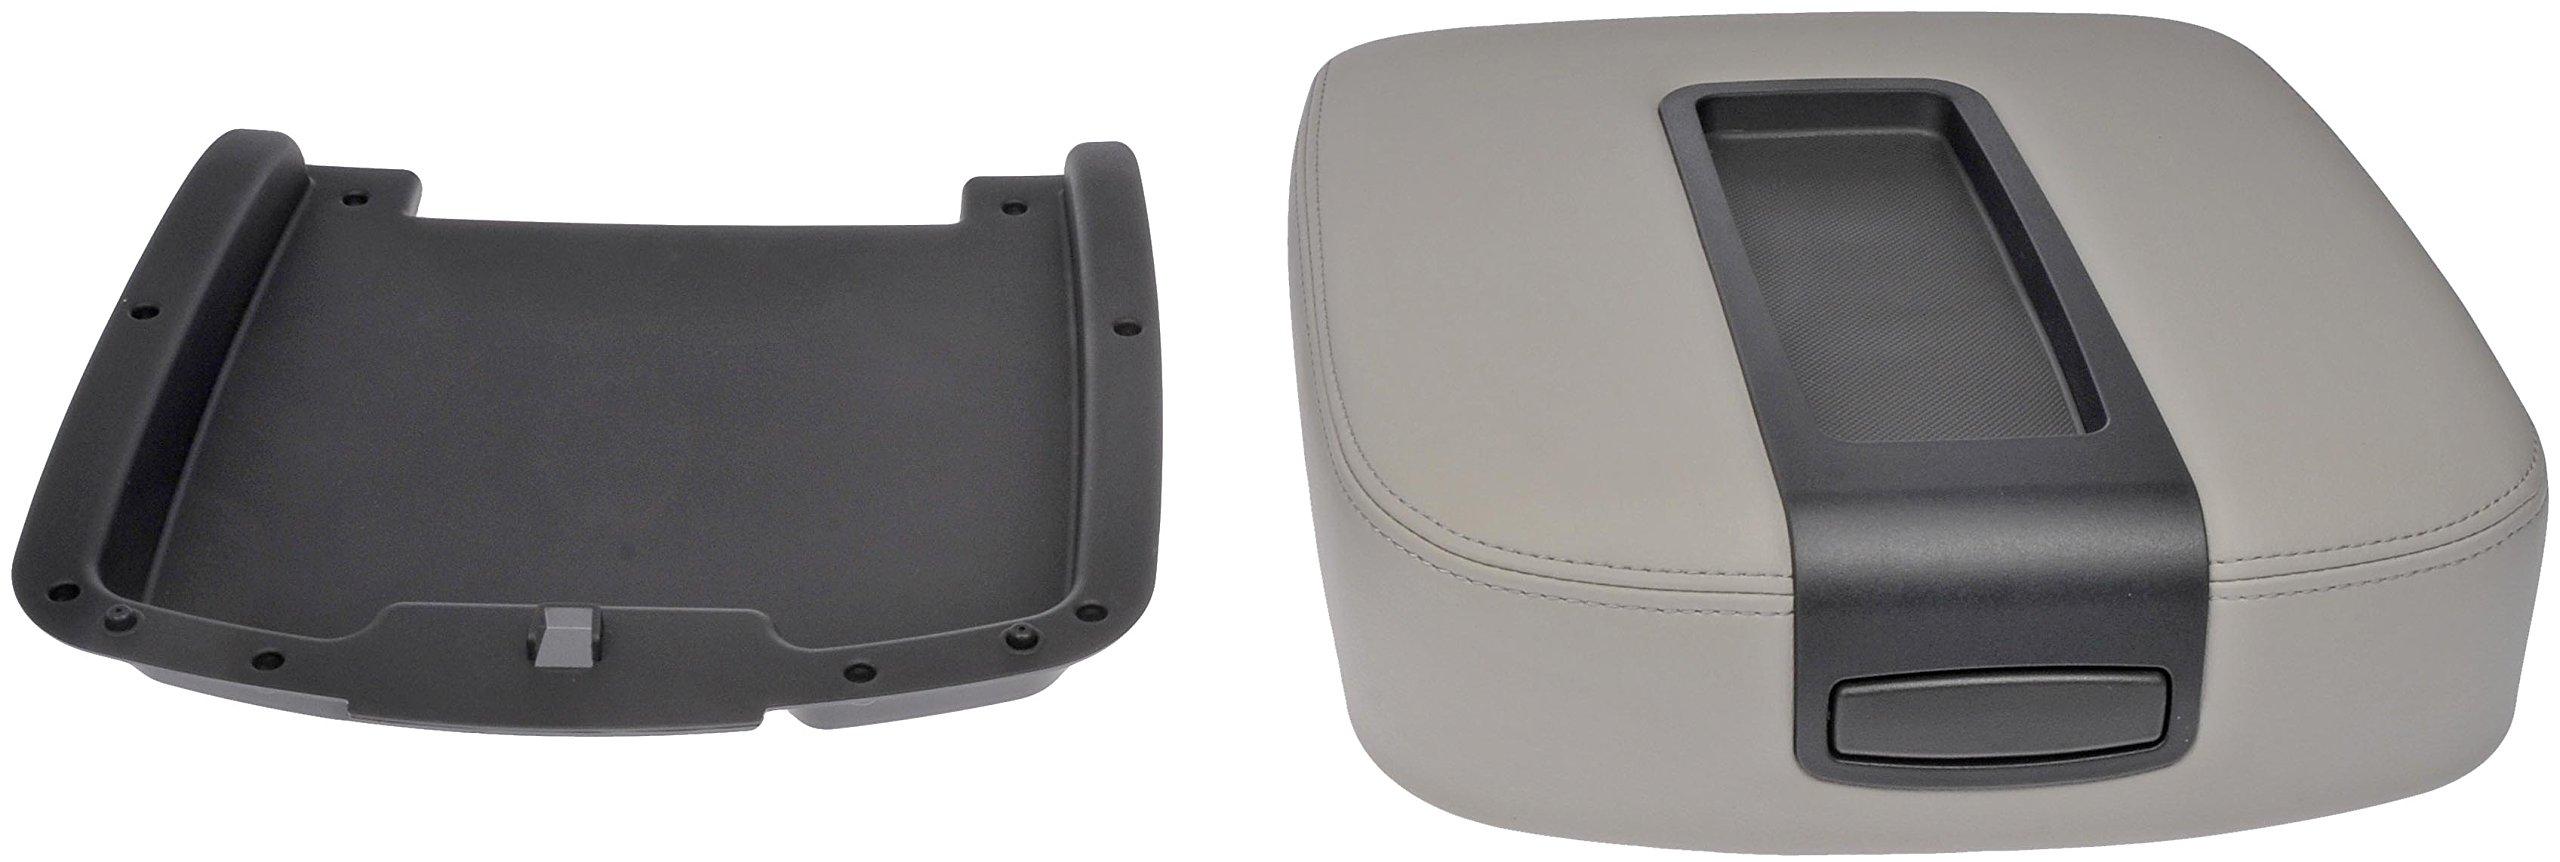 Dorman OE Solutions 924-874 Console Lid Titanium by Dorman (Image #3)